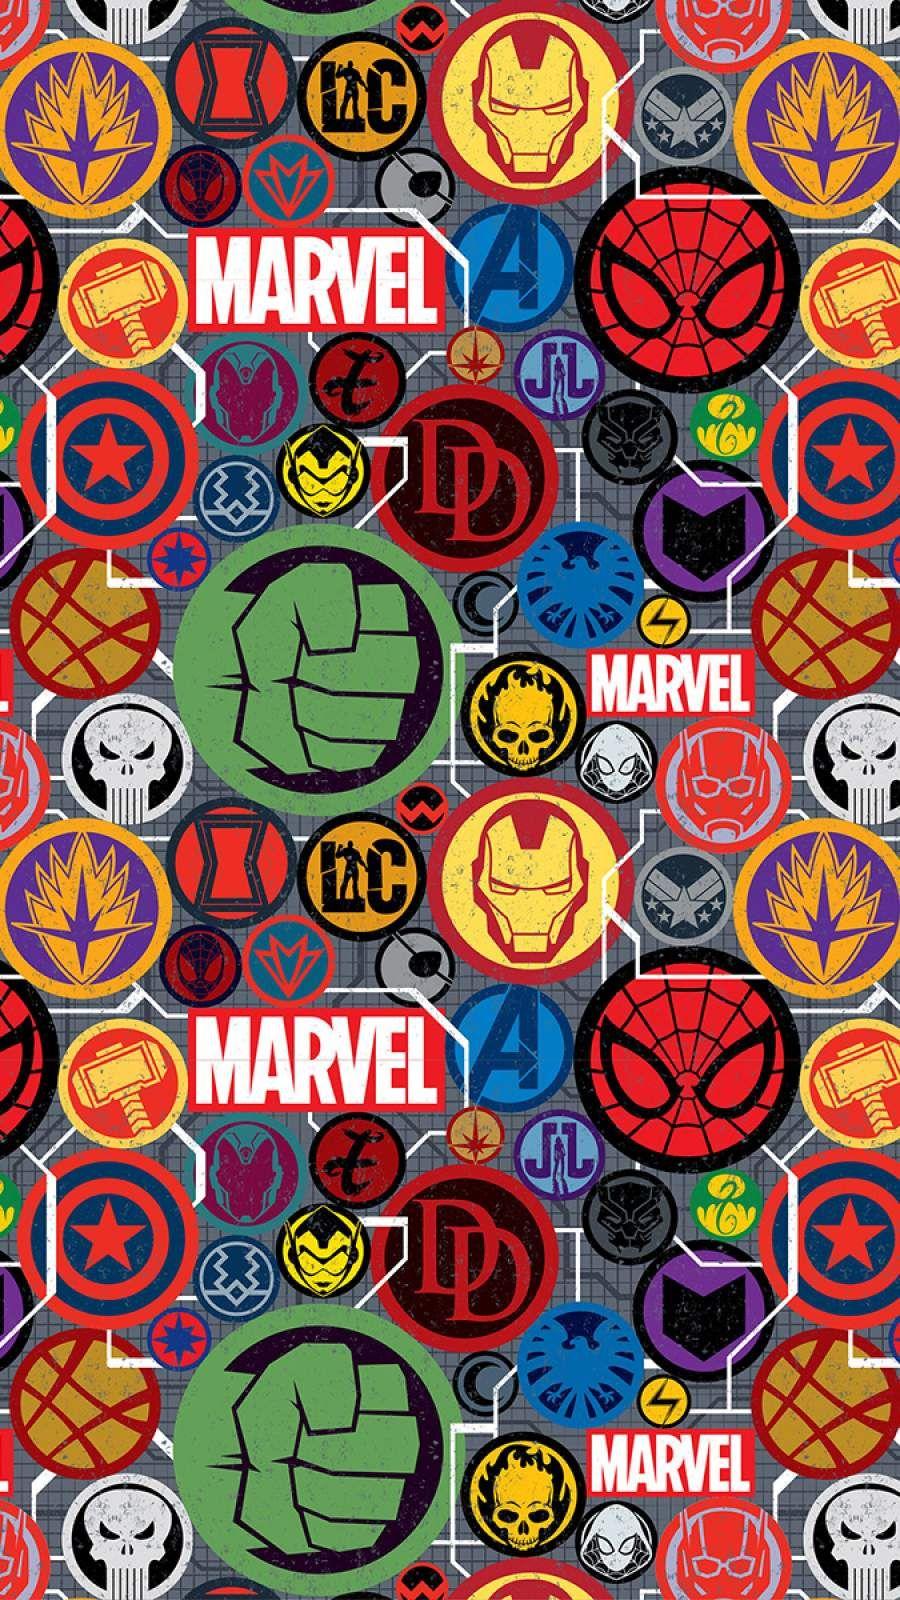 MarvelSuperheroesStickersiPhoneWallpaper Arte da